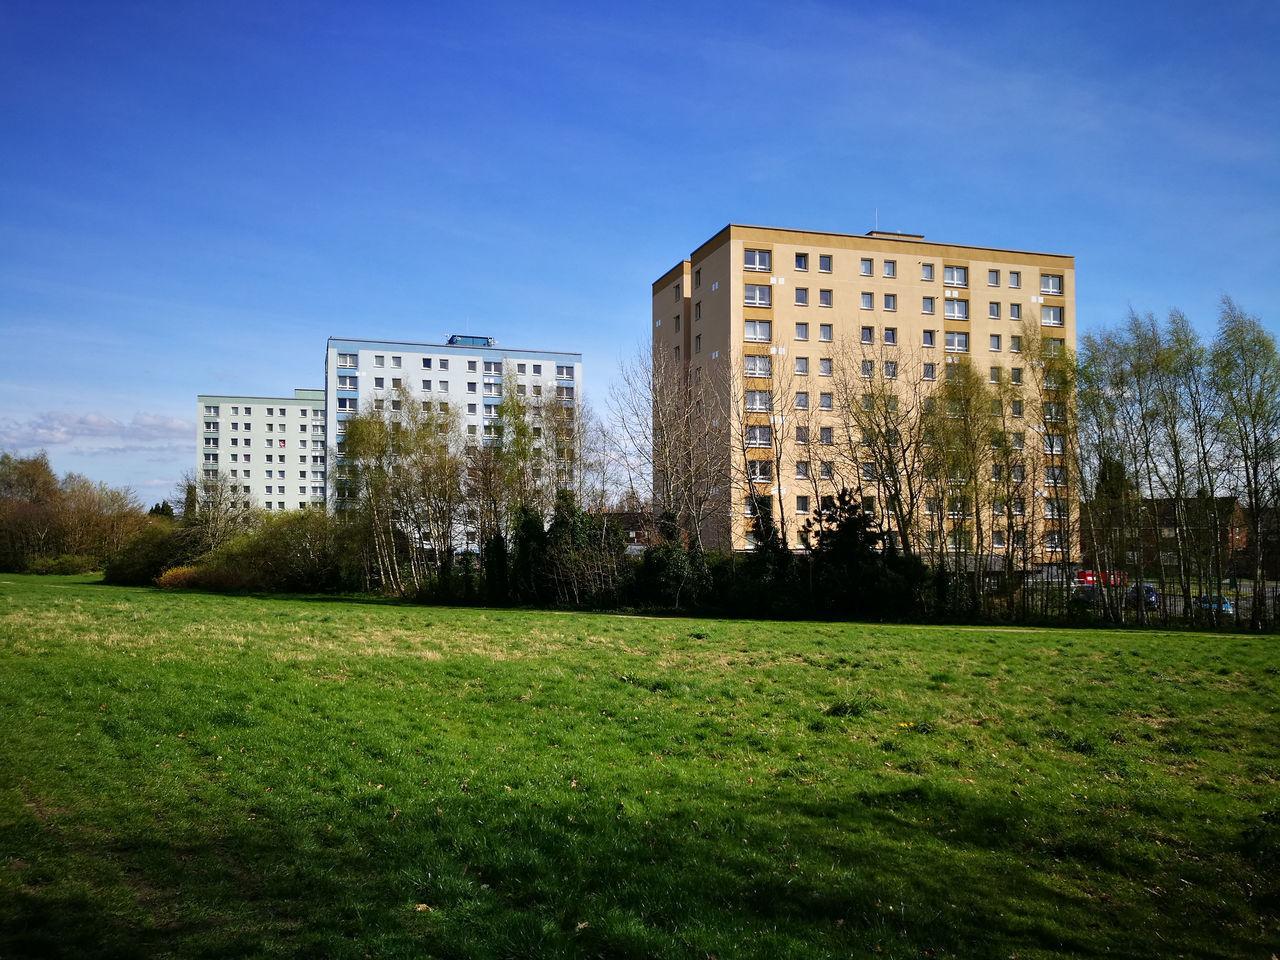 Grass Green Color City Apartment Building Exterior Flats High Rise Sky Blue Day Names Clem Attlee Winston Churchill Hugh Gaitskell Wolverhampton Uk EyeEmNewHere Sunlight